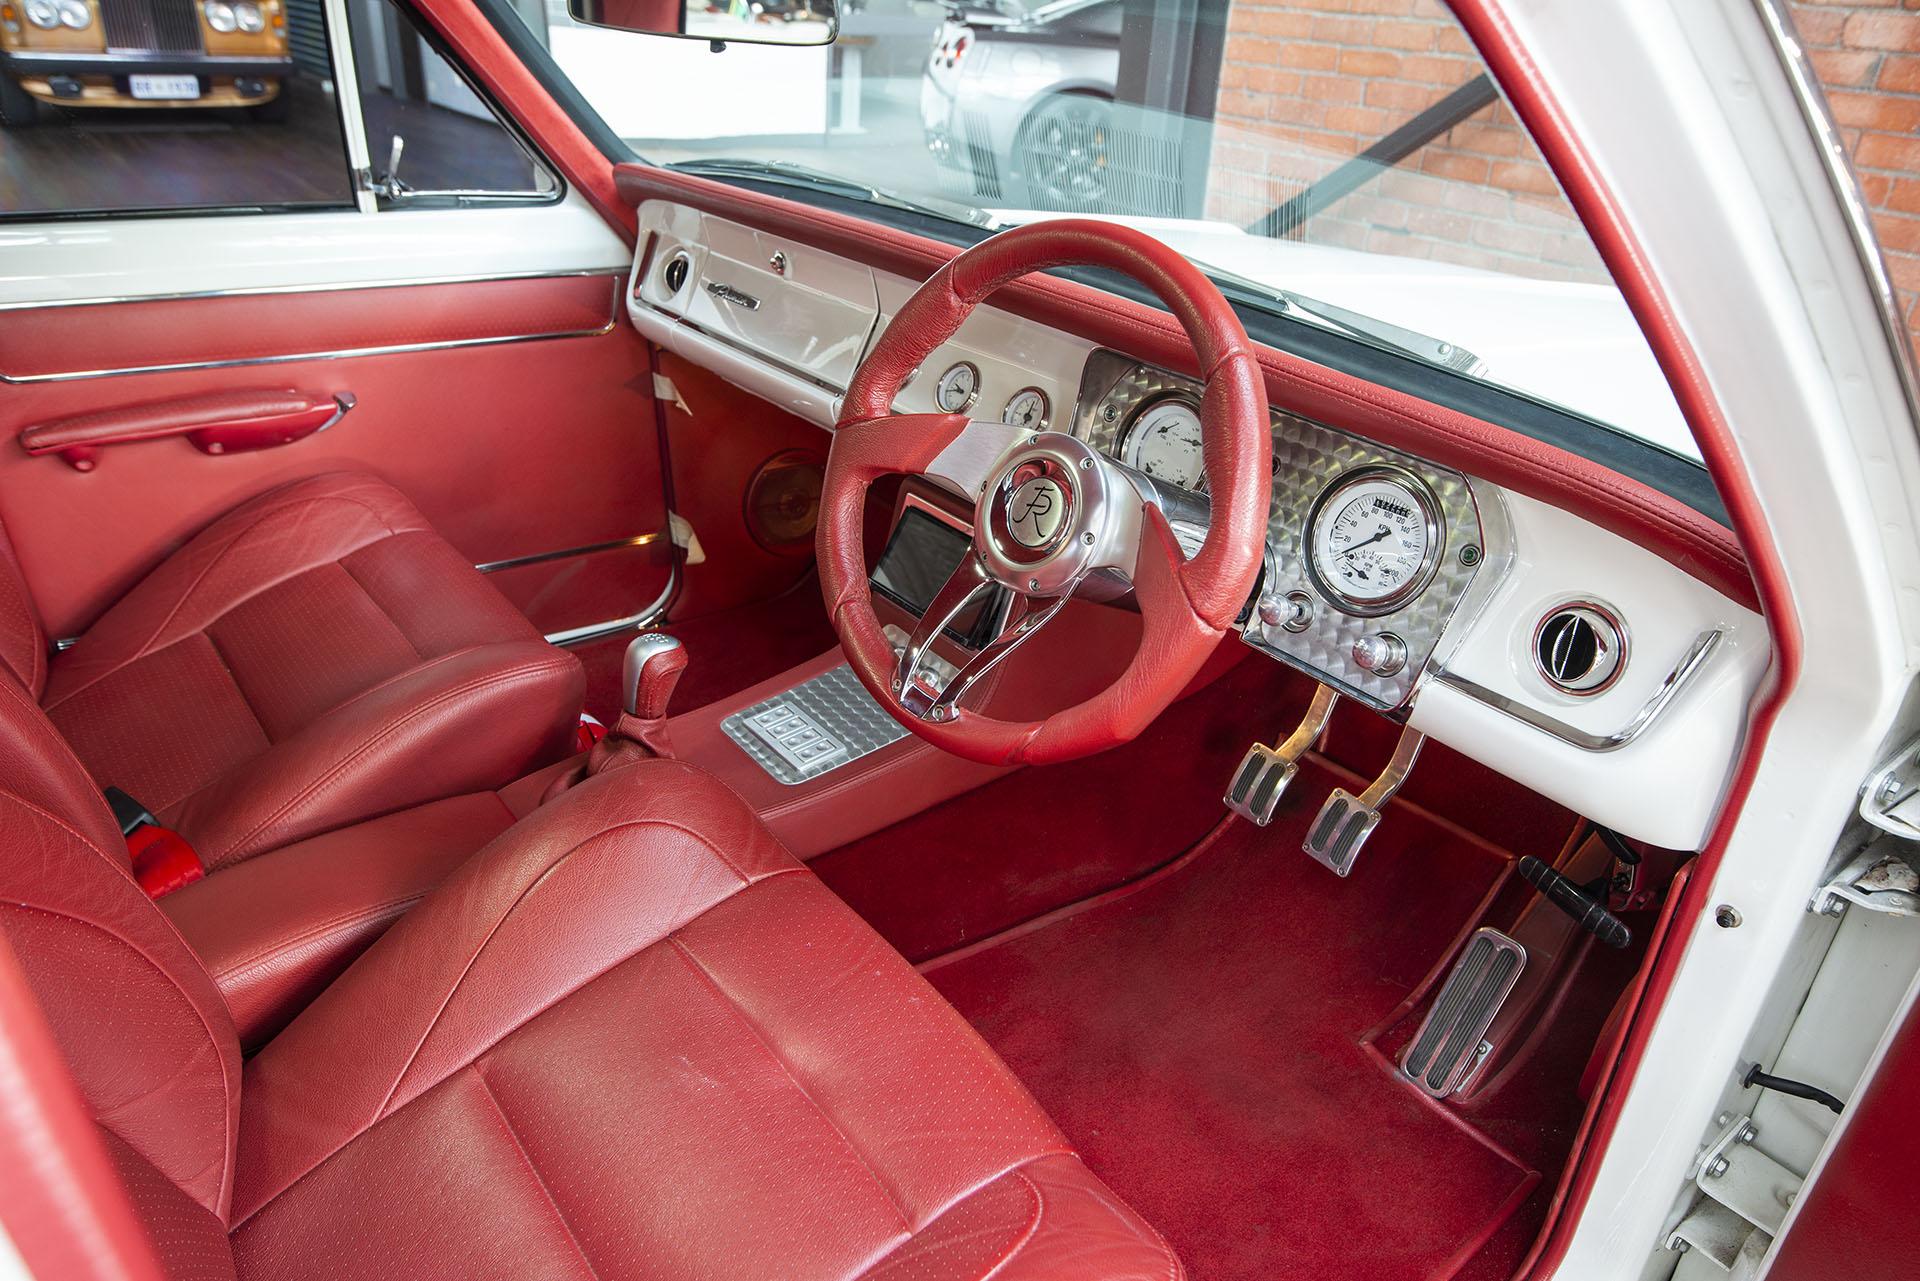 1967 Holden Hr Premier Street Machine - Richmonds - Classic And Prestige Cars